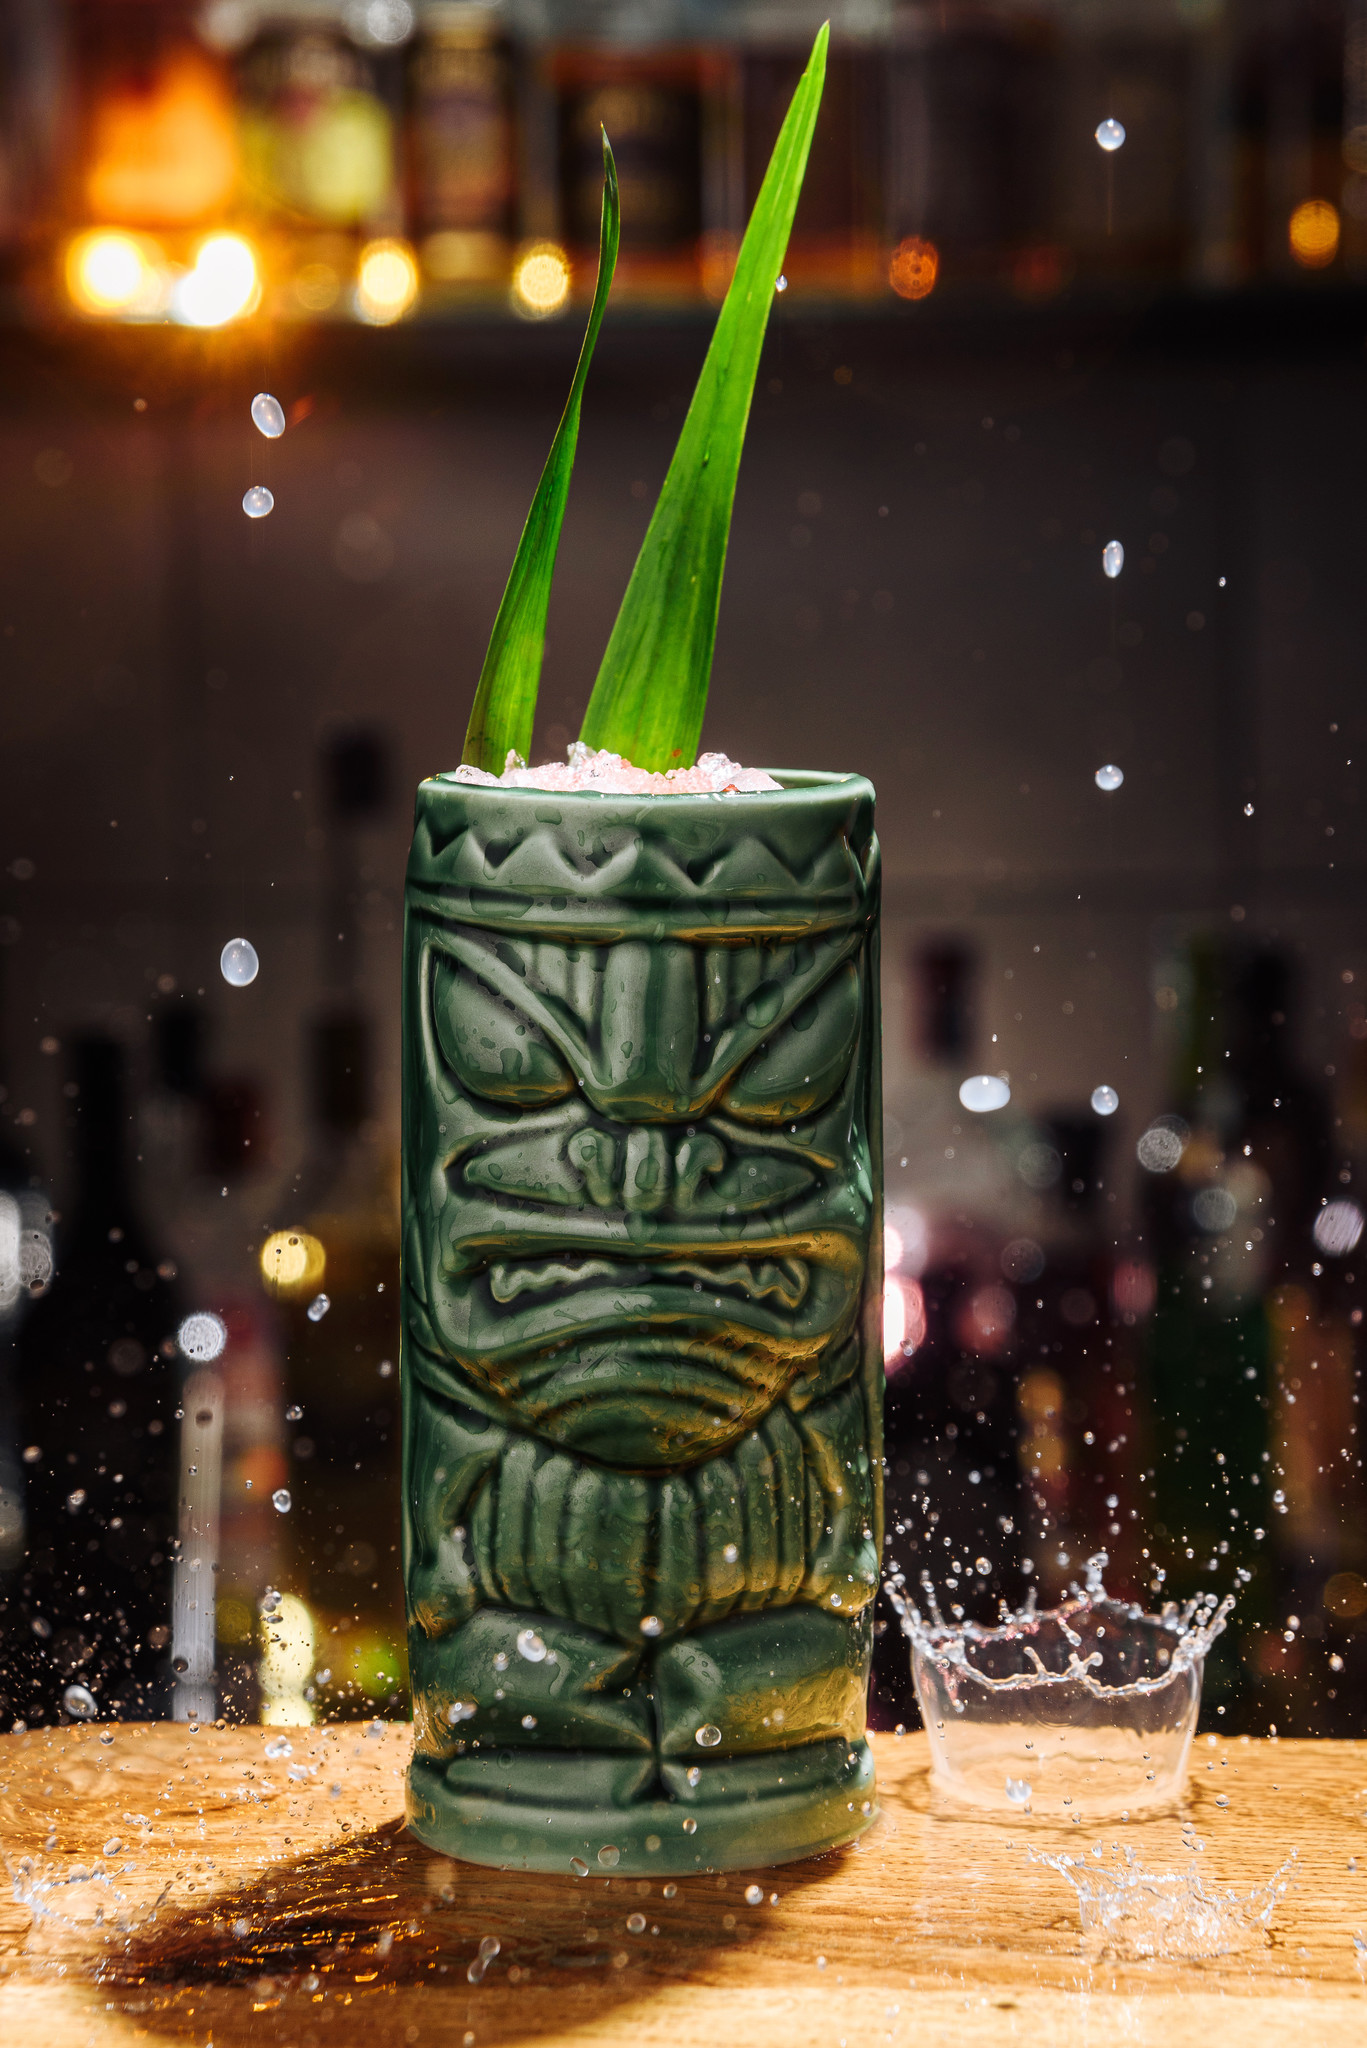 Tiki glazen voor Cocktails